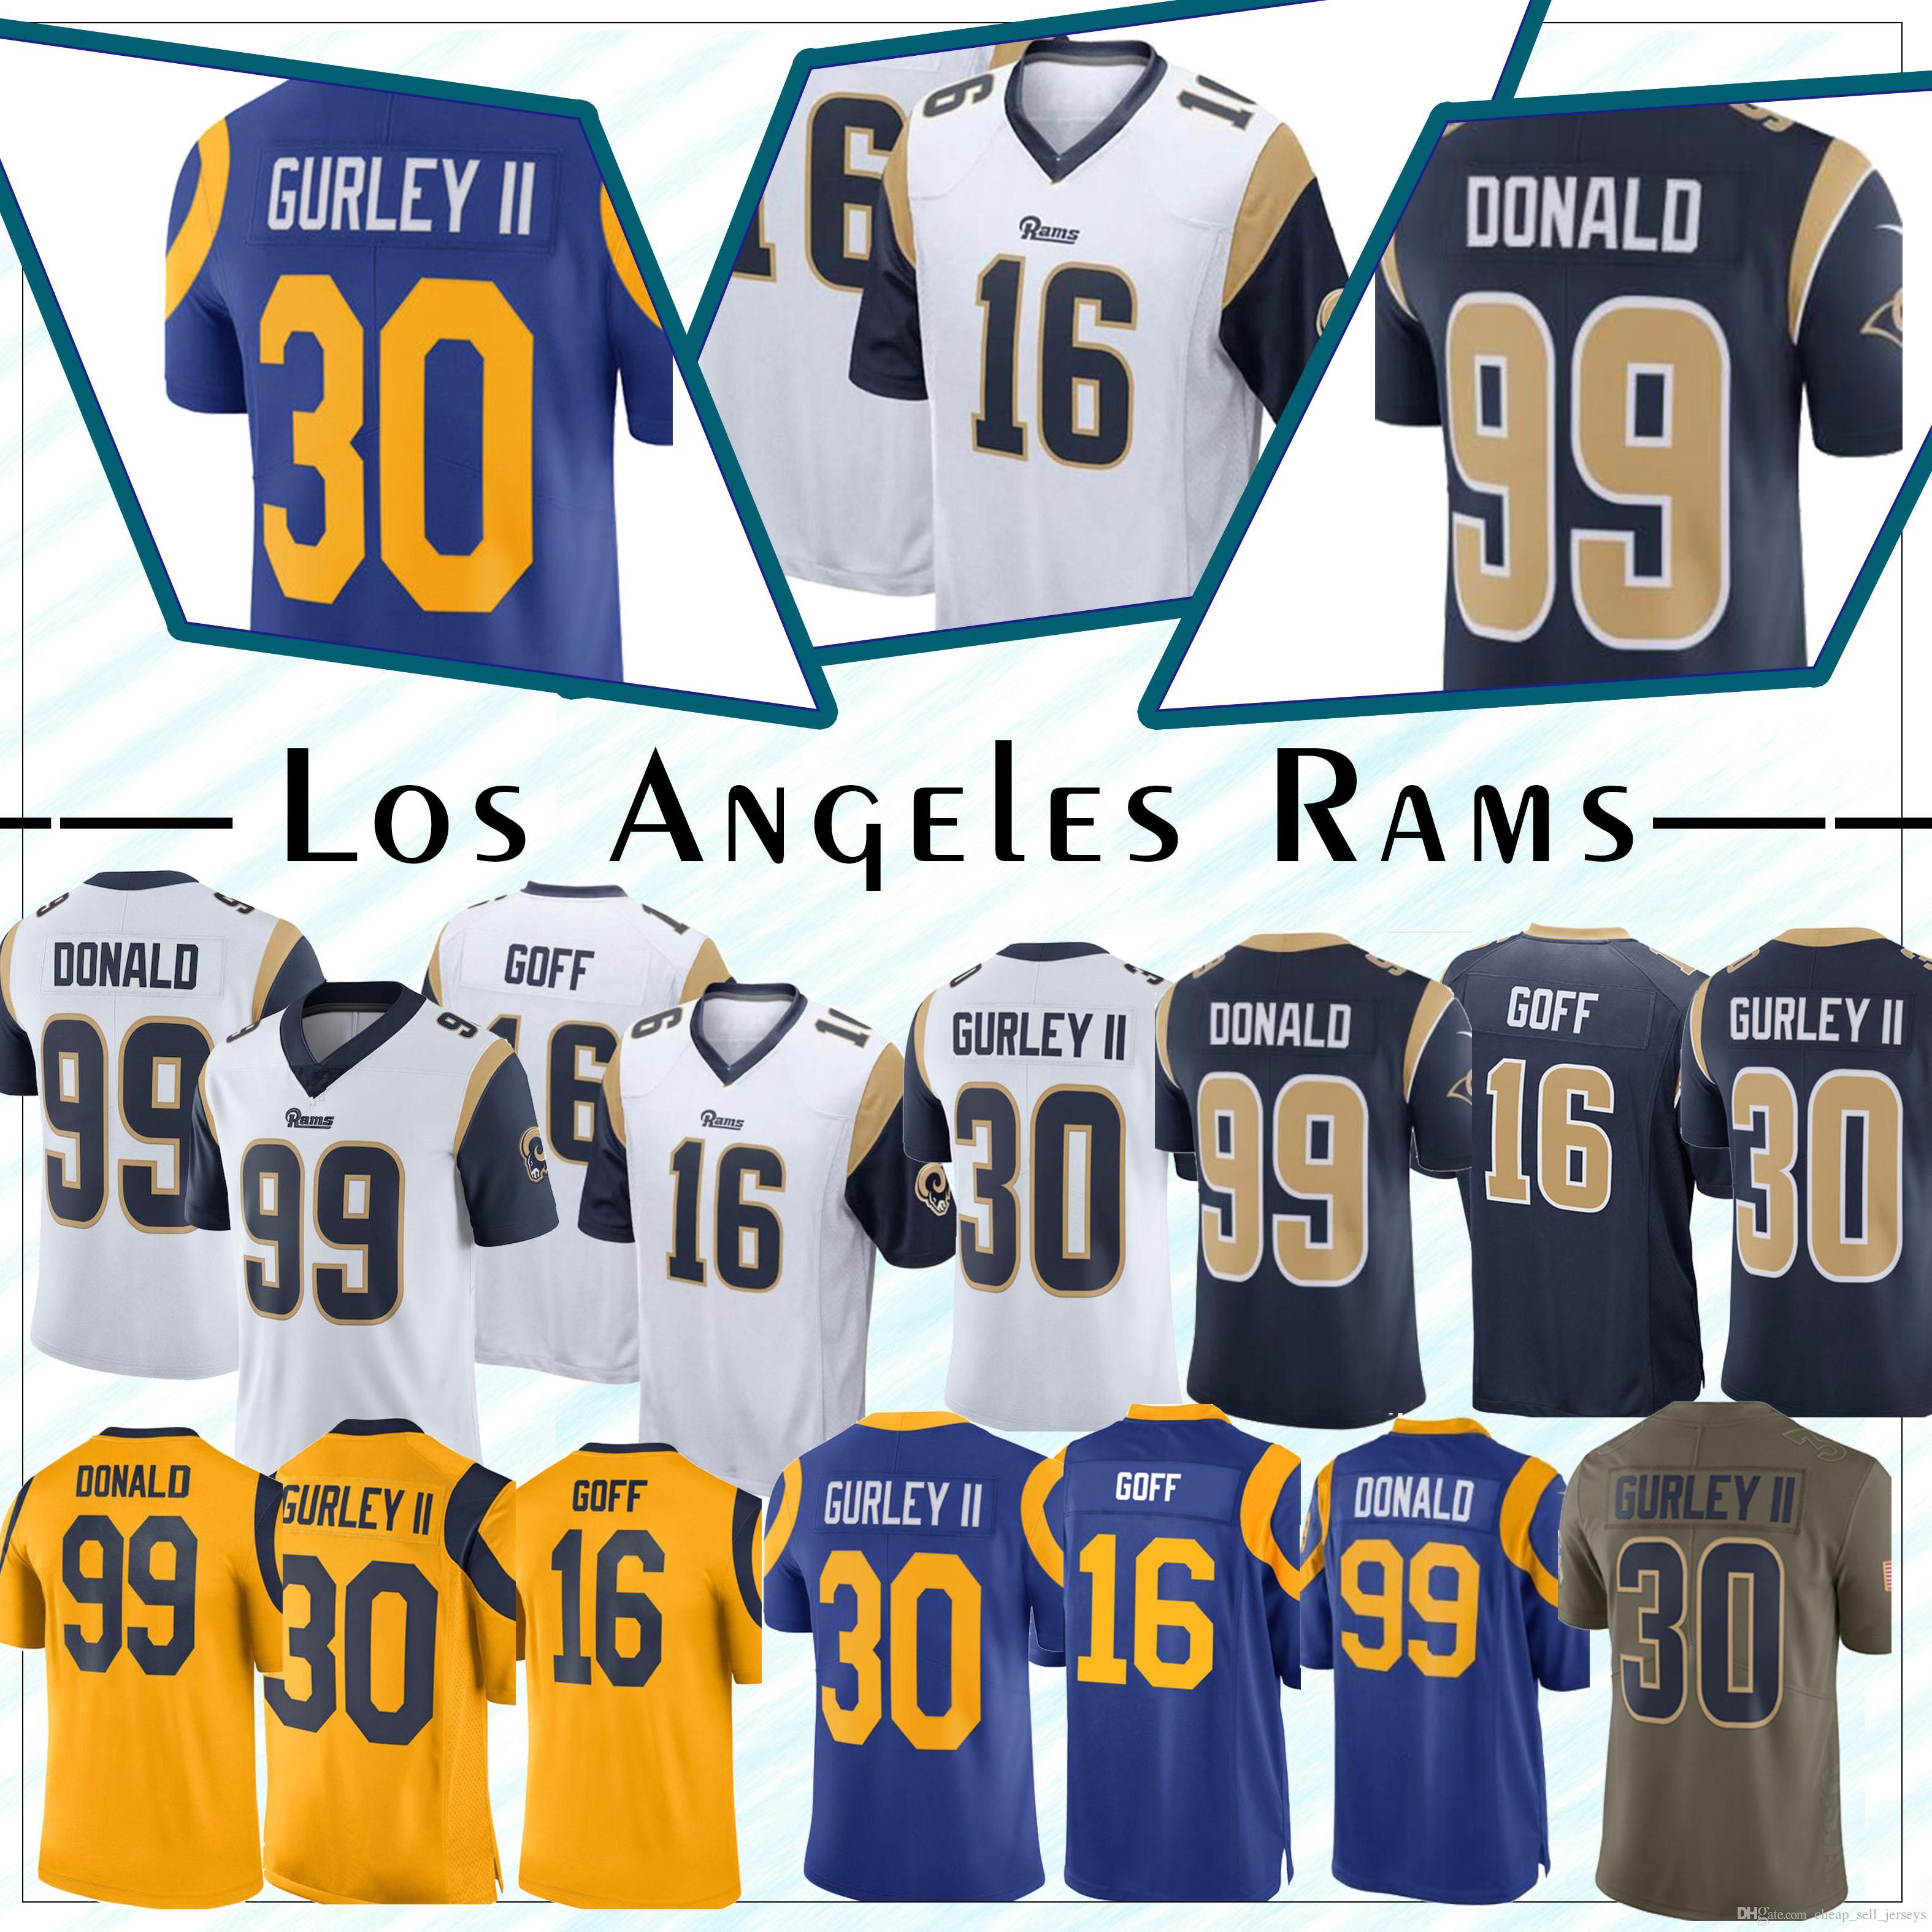 wholesale dealer ef534 89c44 16 Goff Jersey 30 Gurley jersey Los Angeles jersey Rams 99/90 Aaron Donald  5 Nick Foles Los Angeles